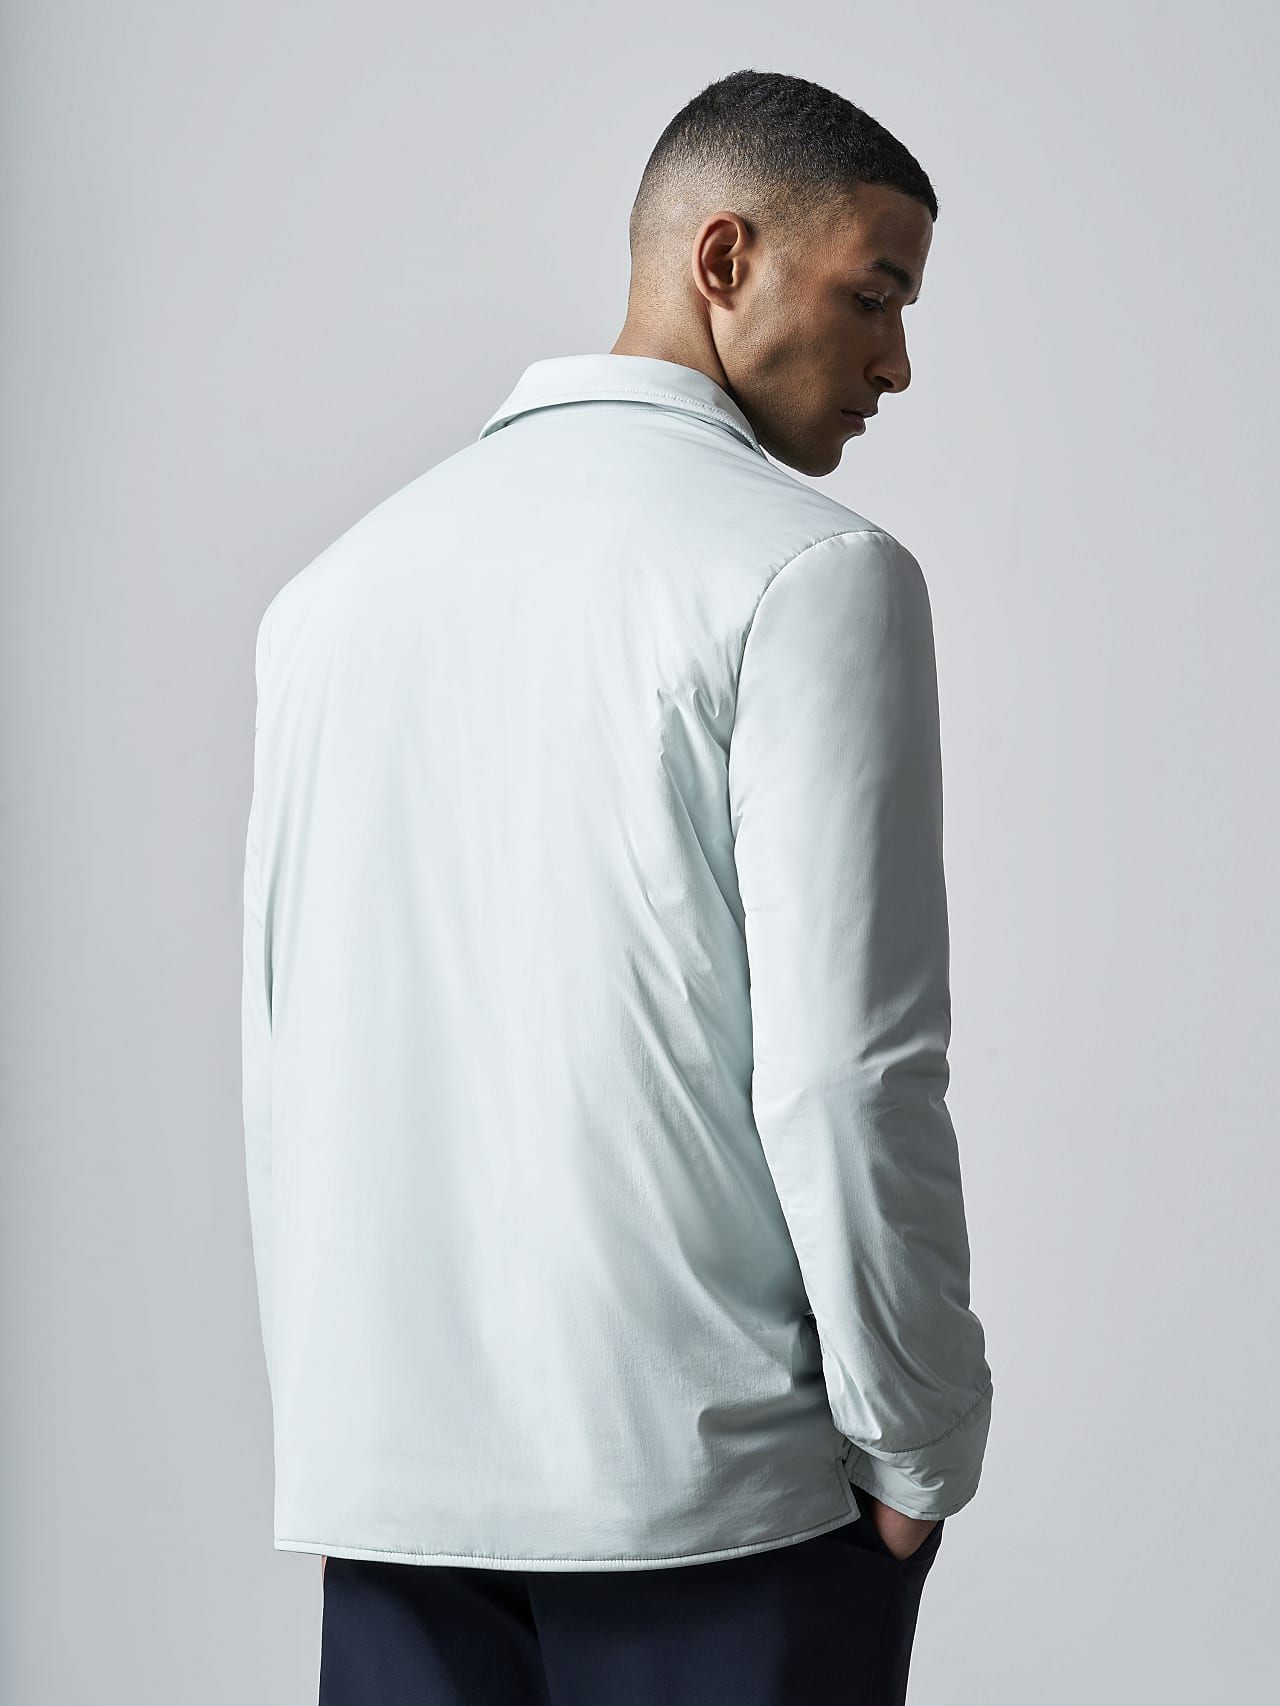 OVASU V1.Y5.02 PrimaLoft® Overshirt Jacket Pale Blue  Front Main Alpha Tauri